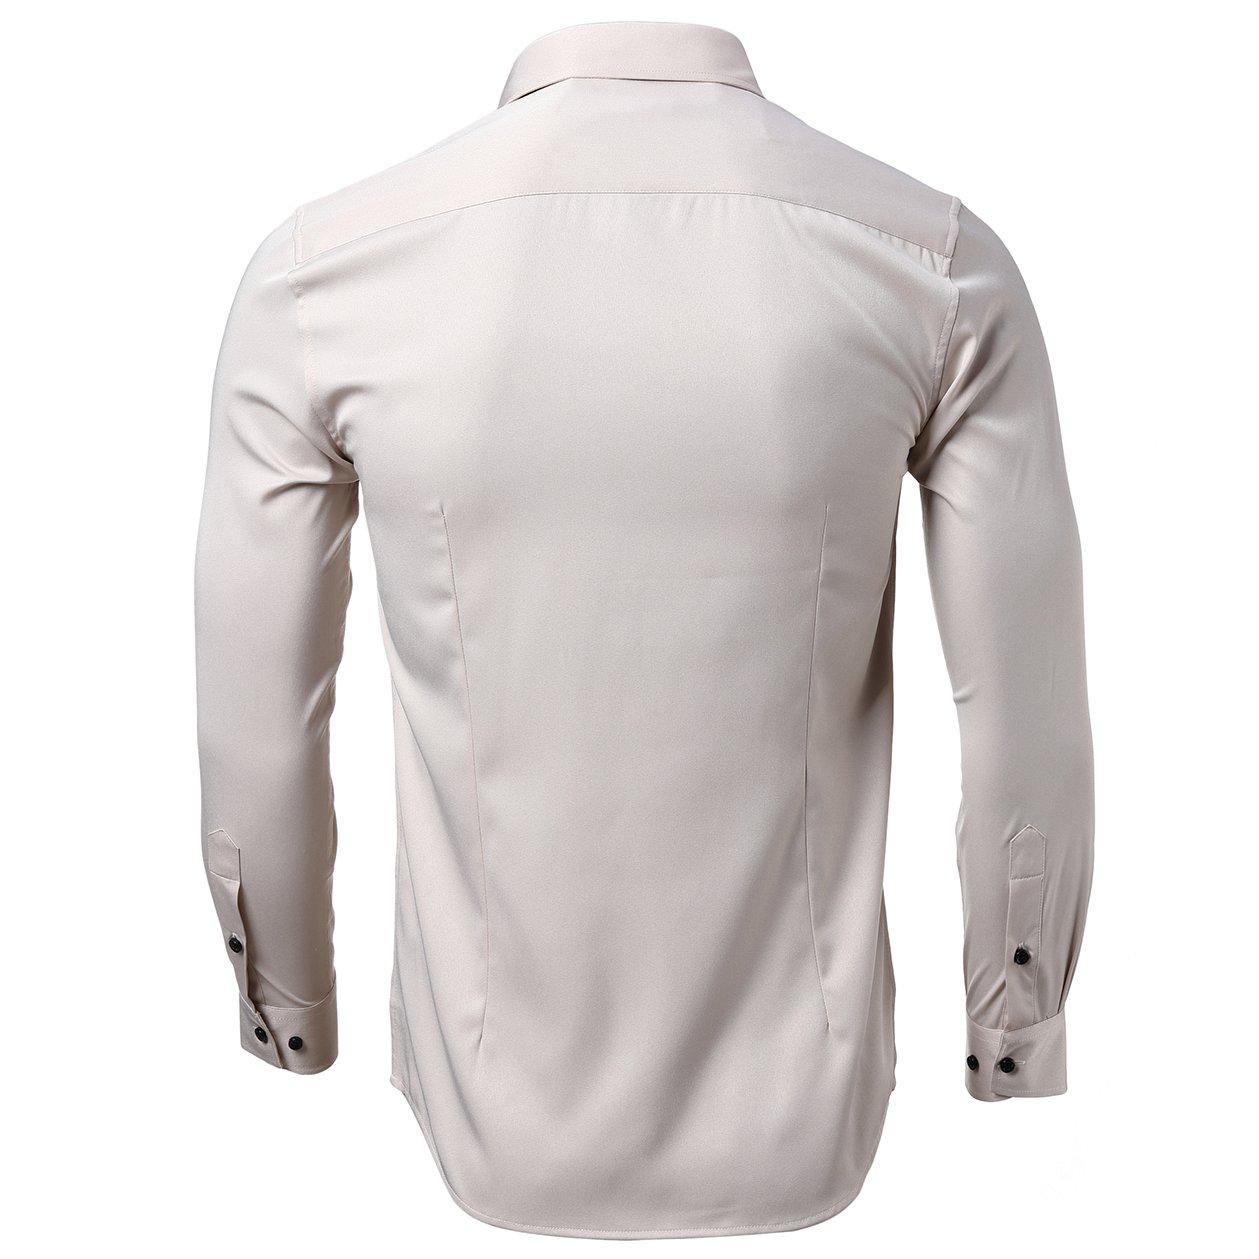 e417b44981c KelaSip Camisa para Hombres Transpirable Manga Larga Color Sólido ...